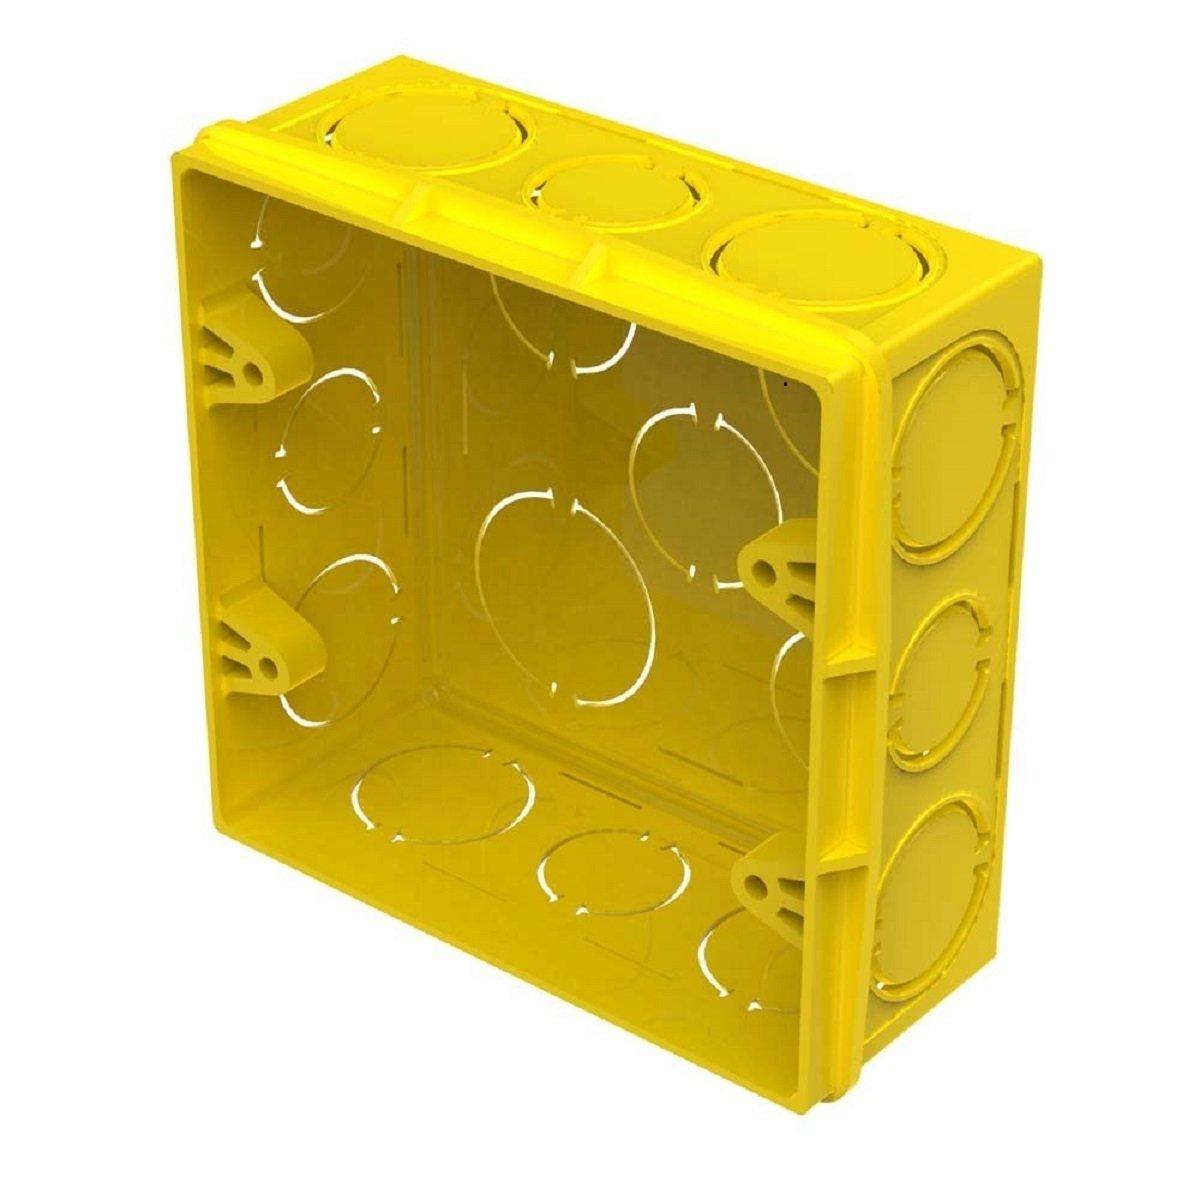 Caixa Luz 4x4 Amarela - Amanco